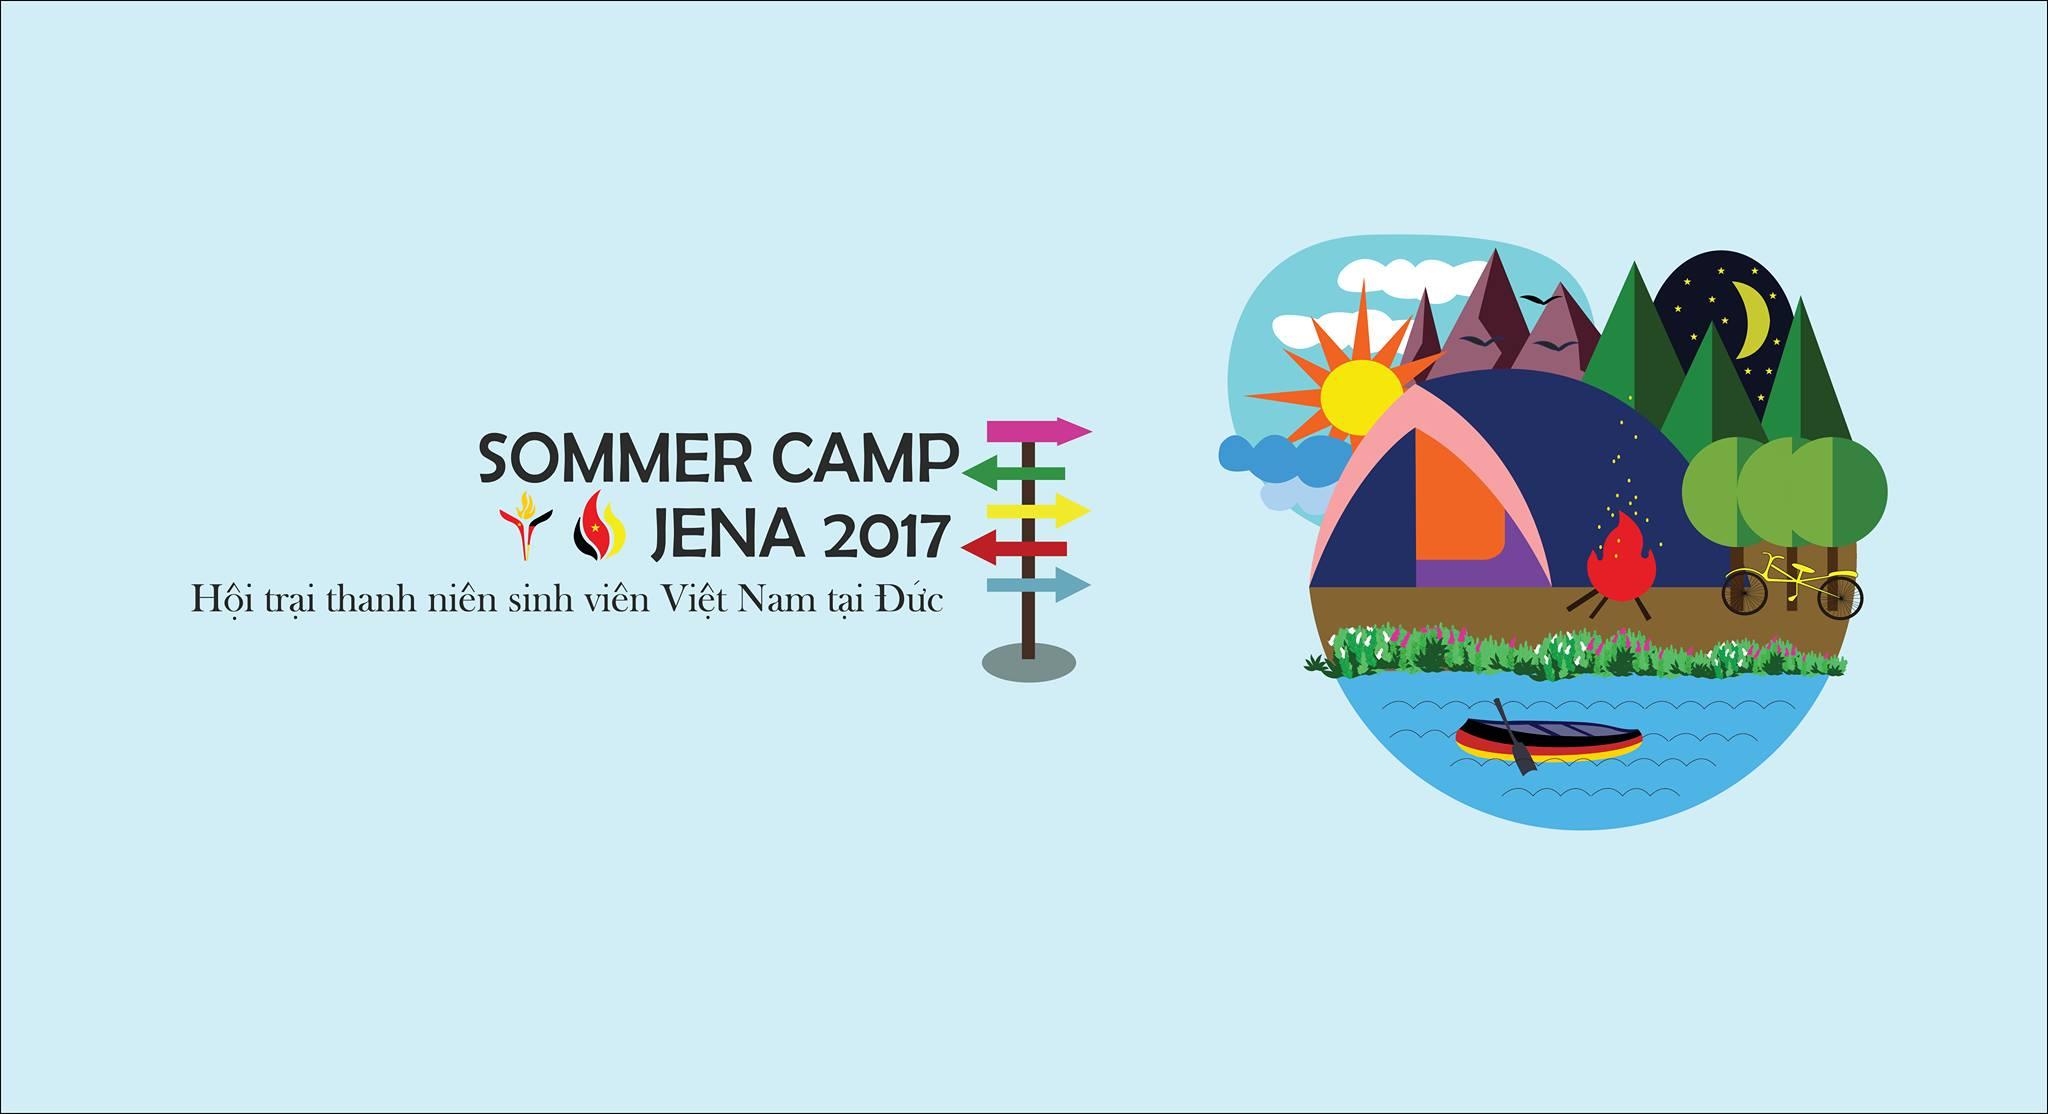 Hội trại Sividuc - Sommer Camp Jena 2017